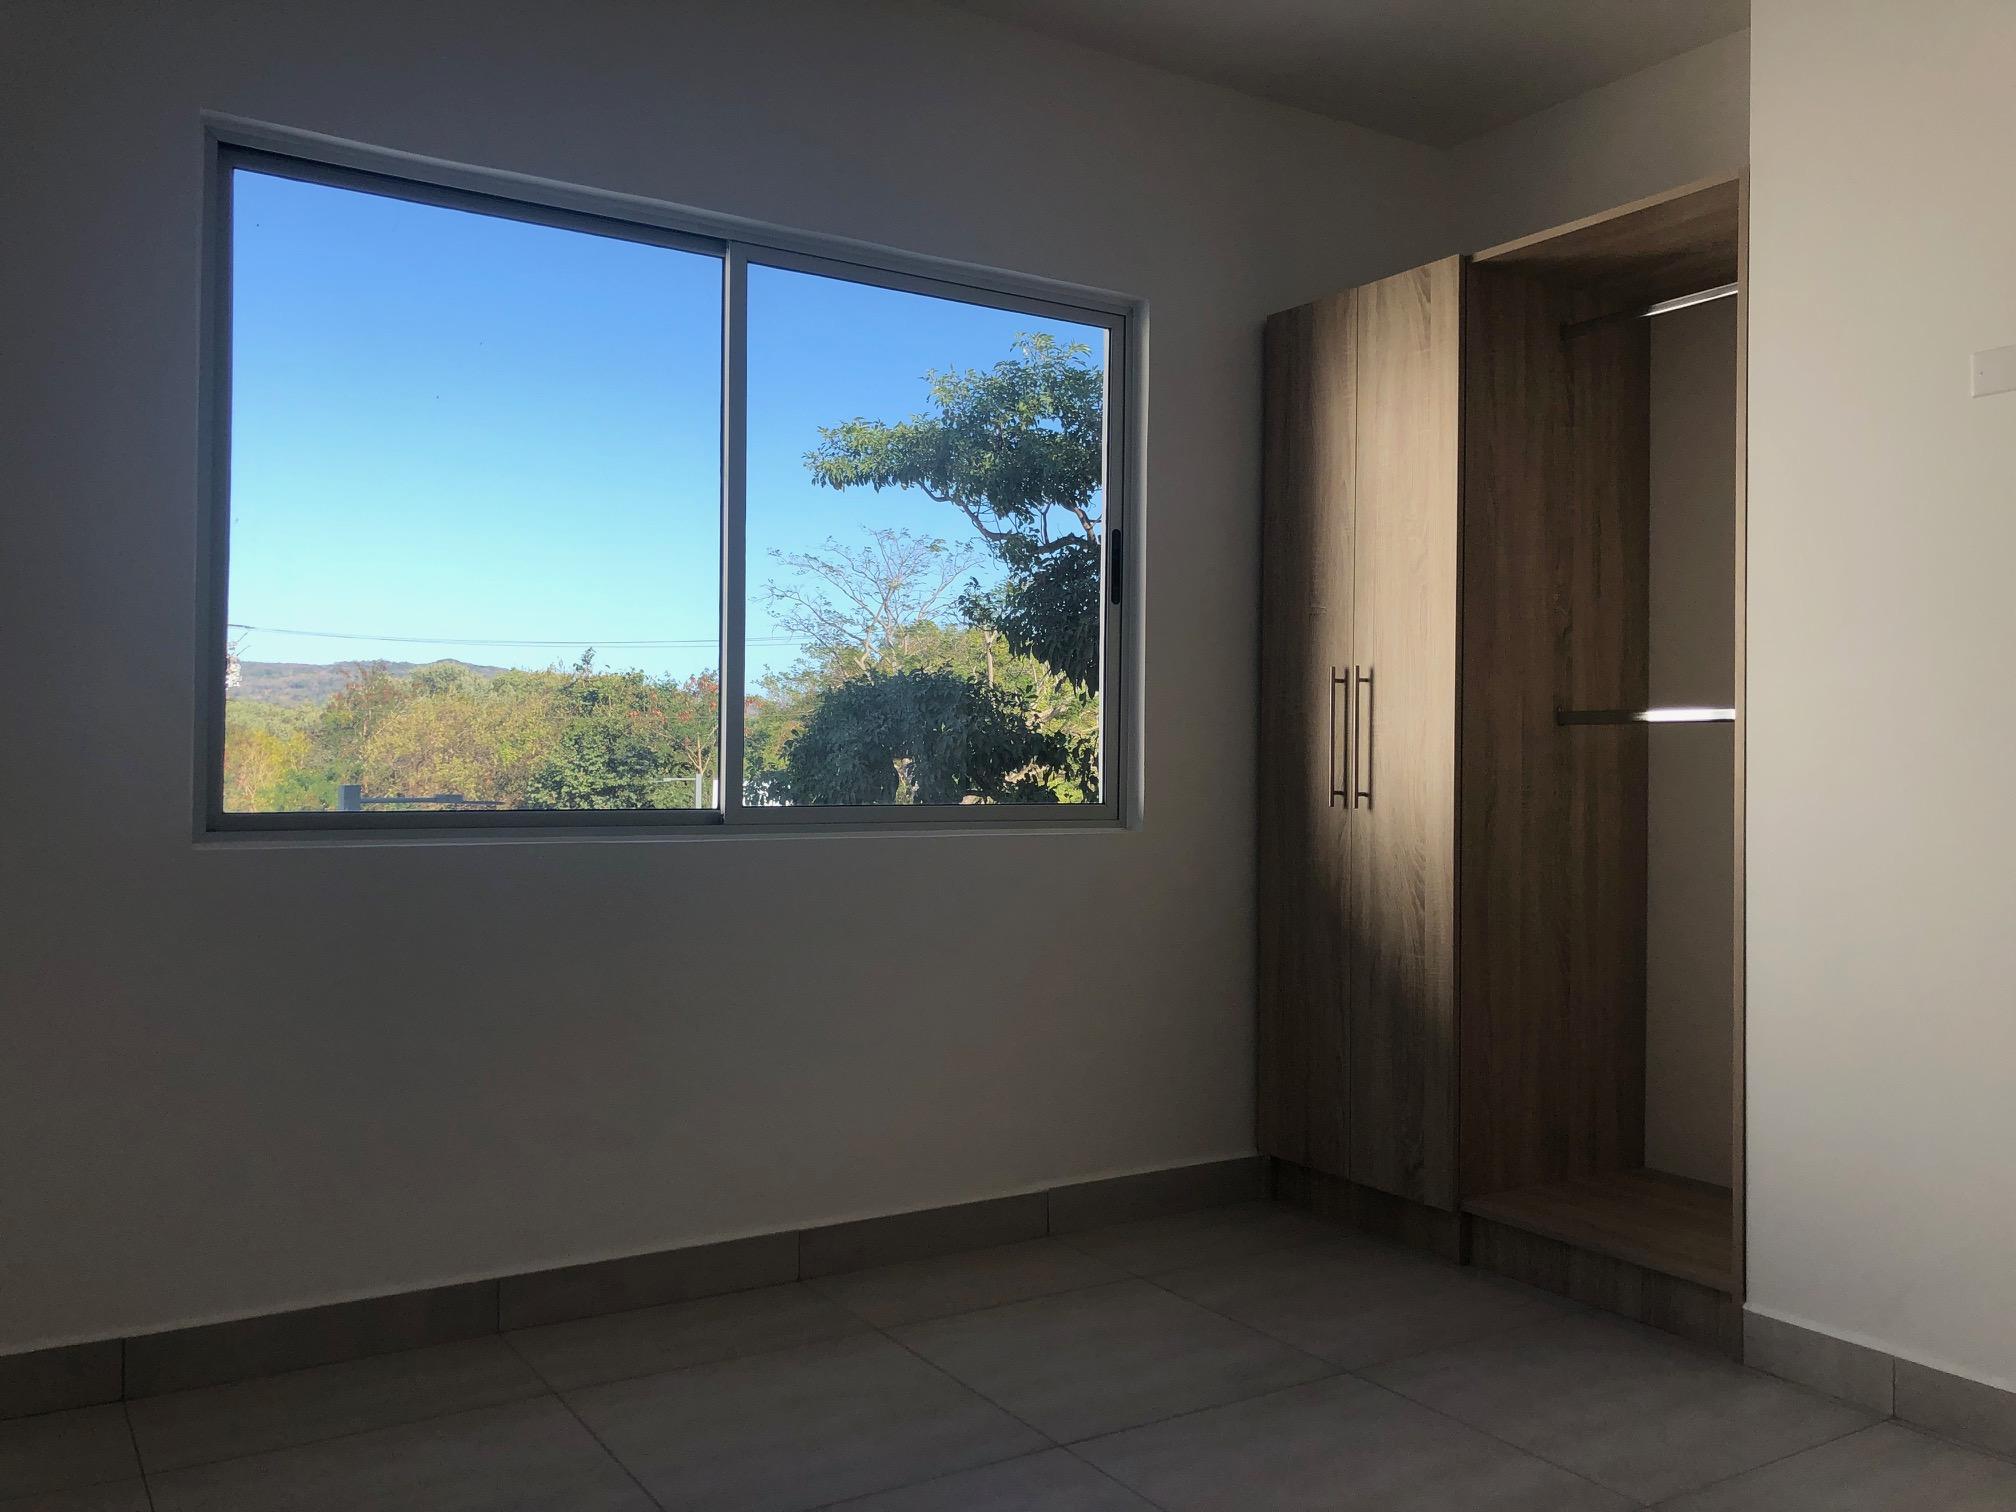 Real Estate For Nicaragua 8.jpg